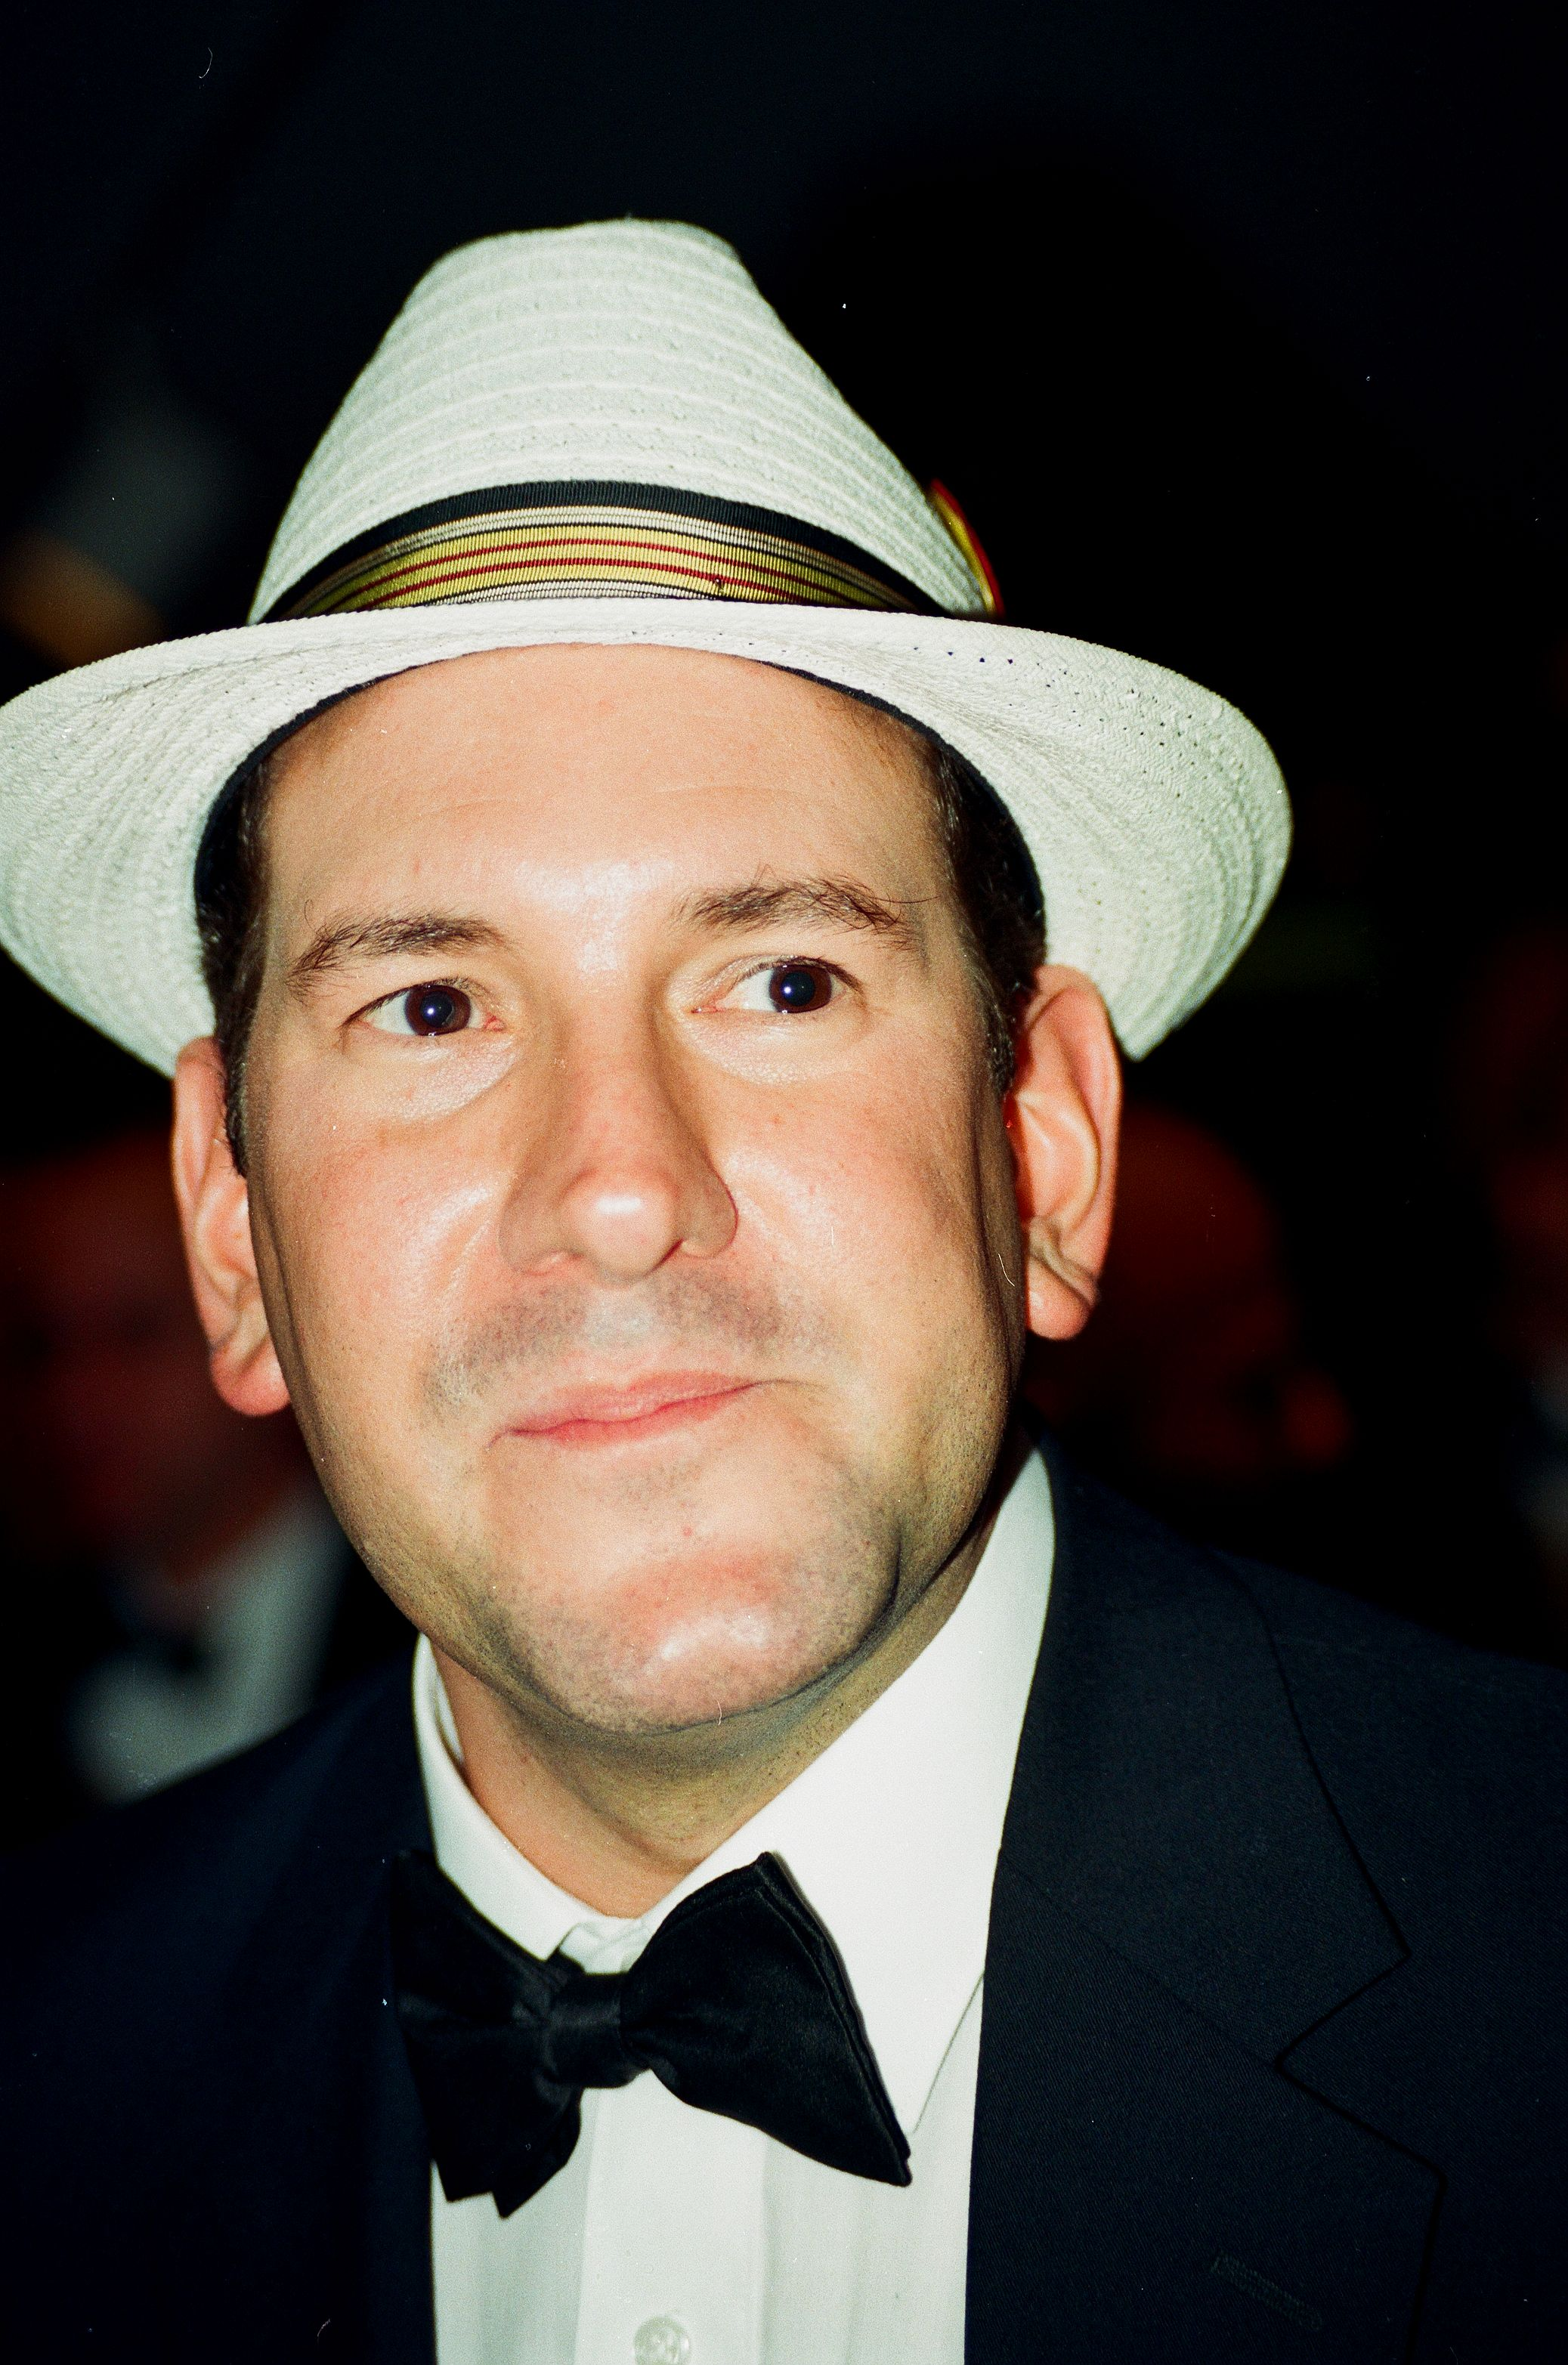 Matt Drudge - Wikipedia